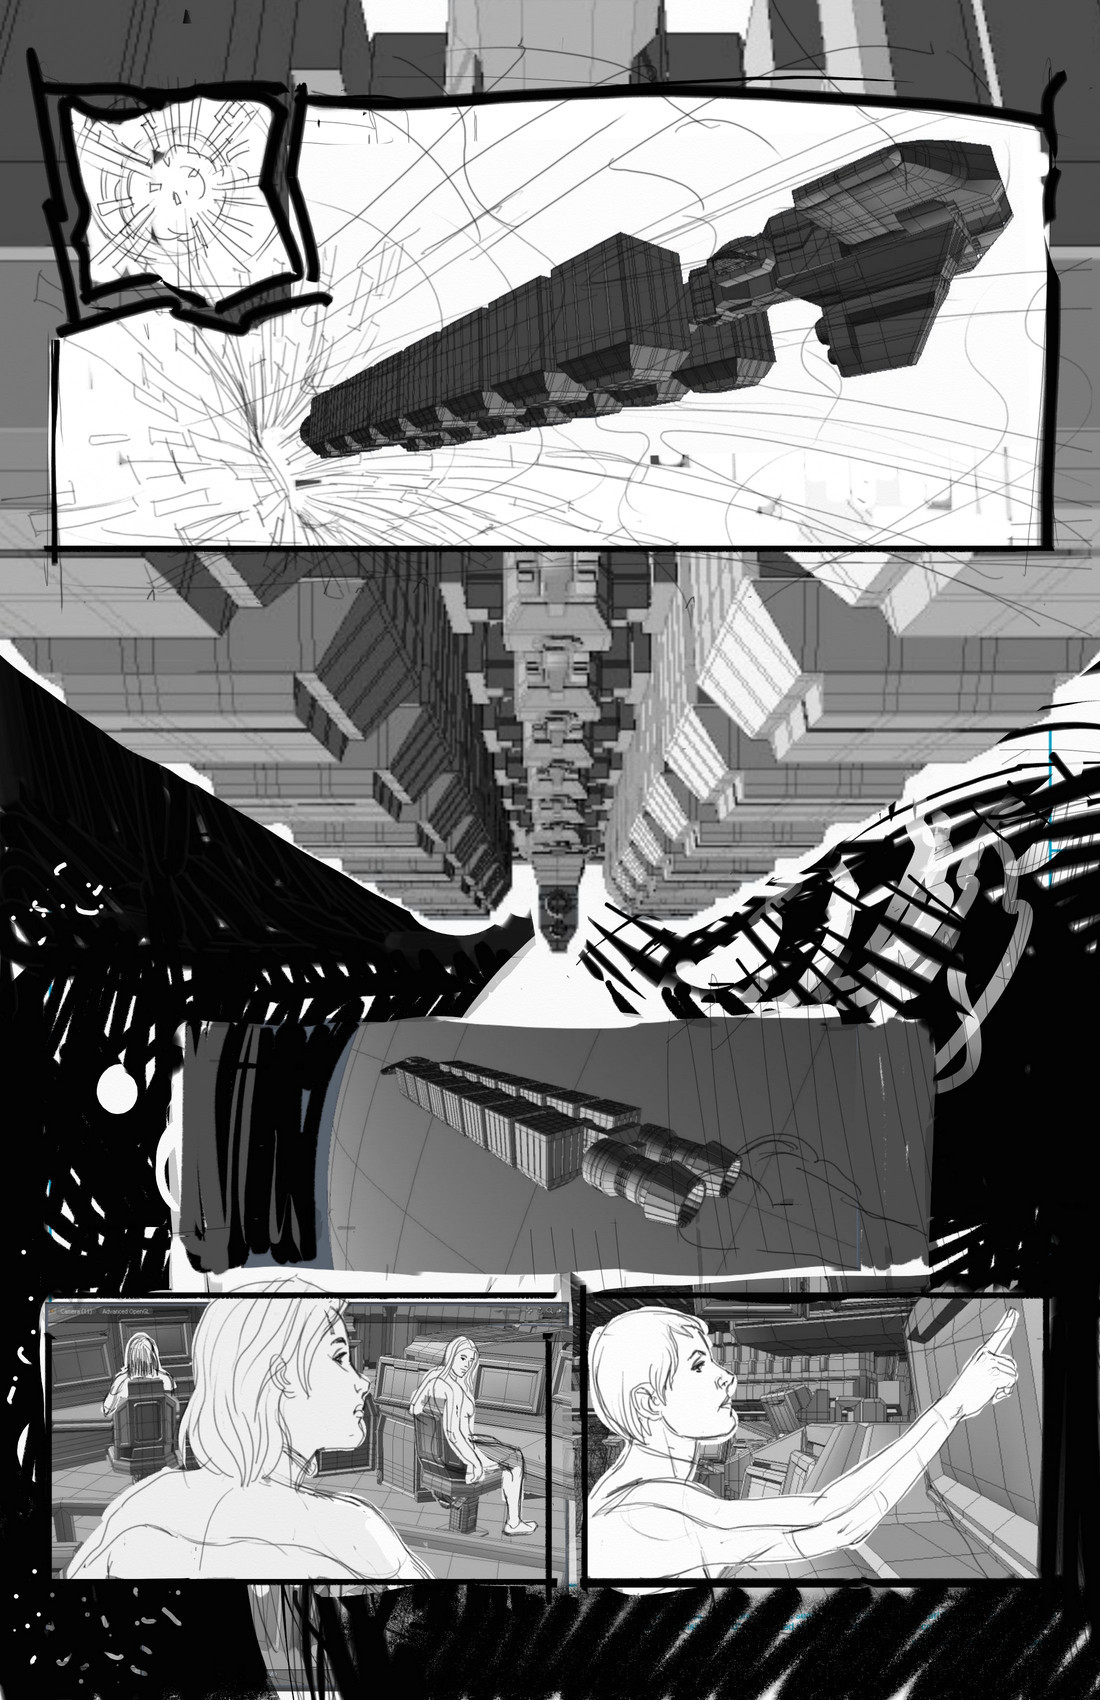 Zoltan korcsok page6penciling5